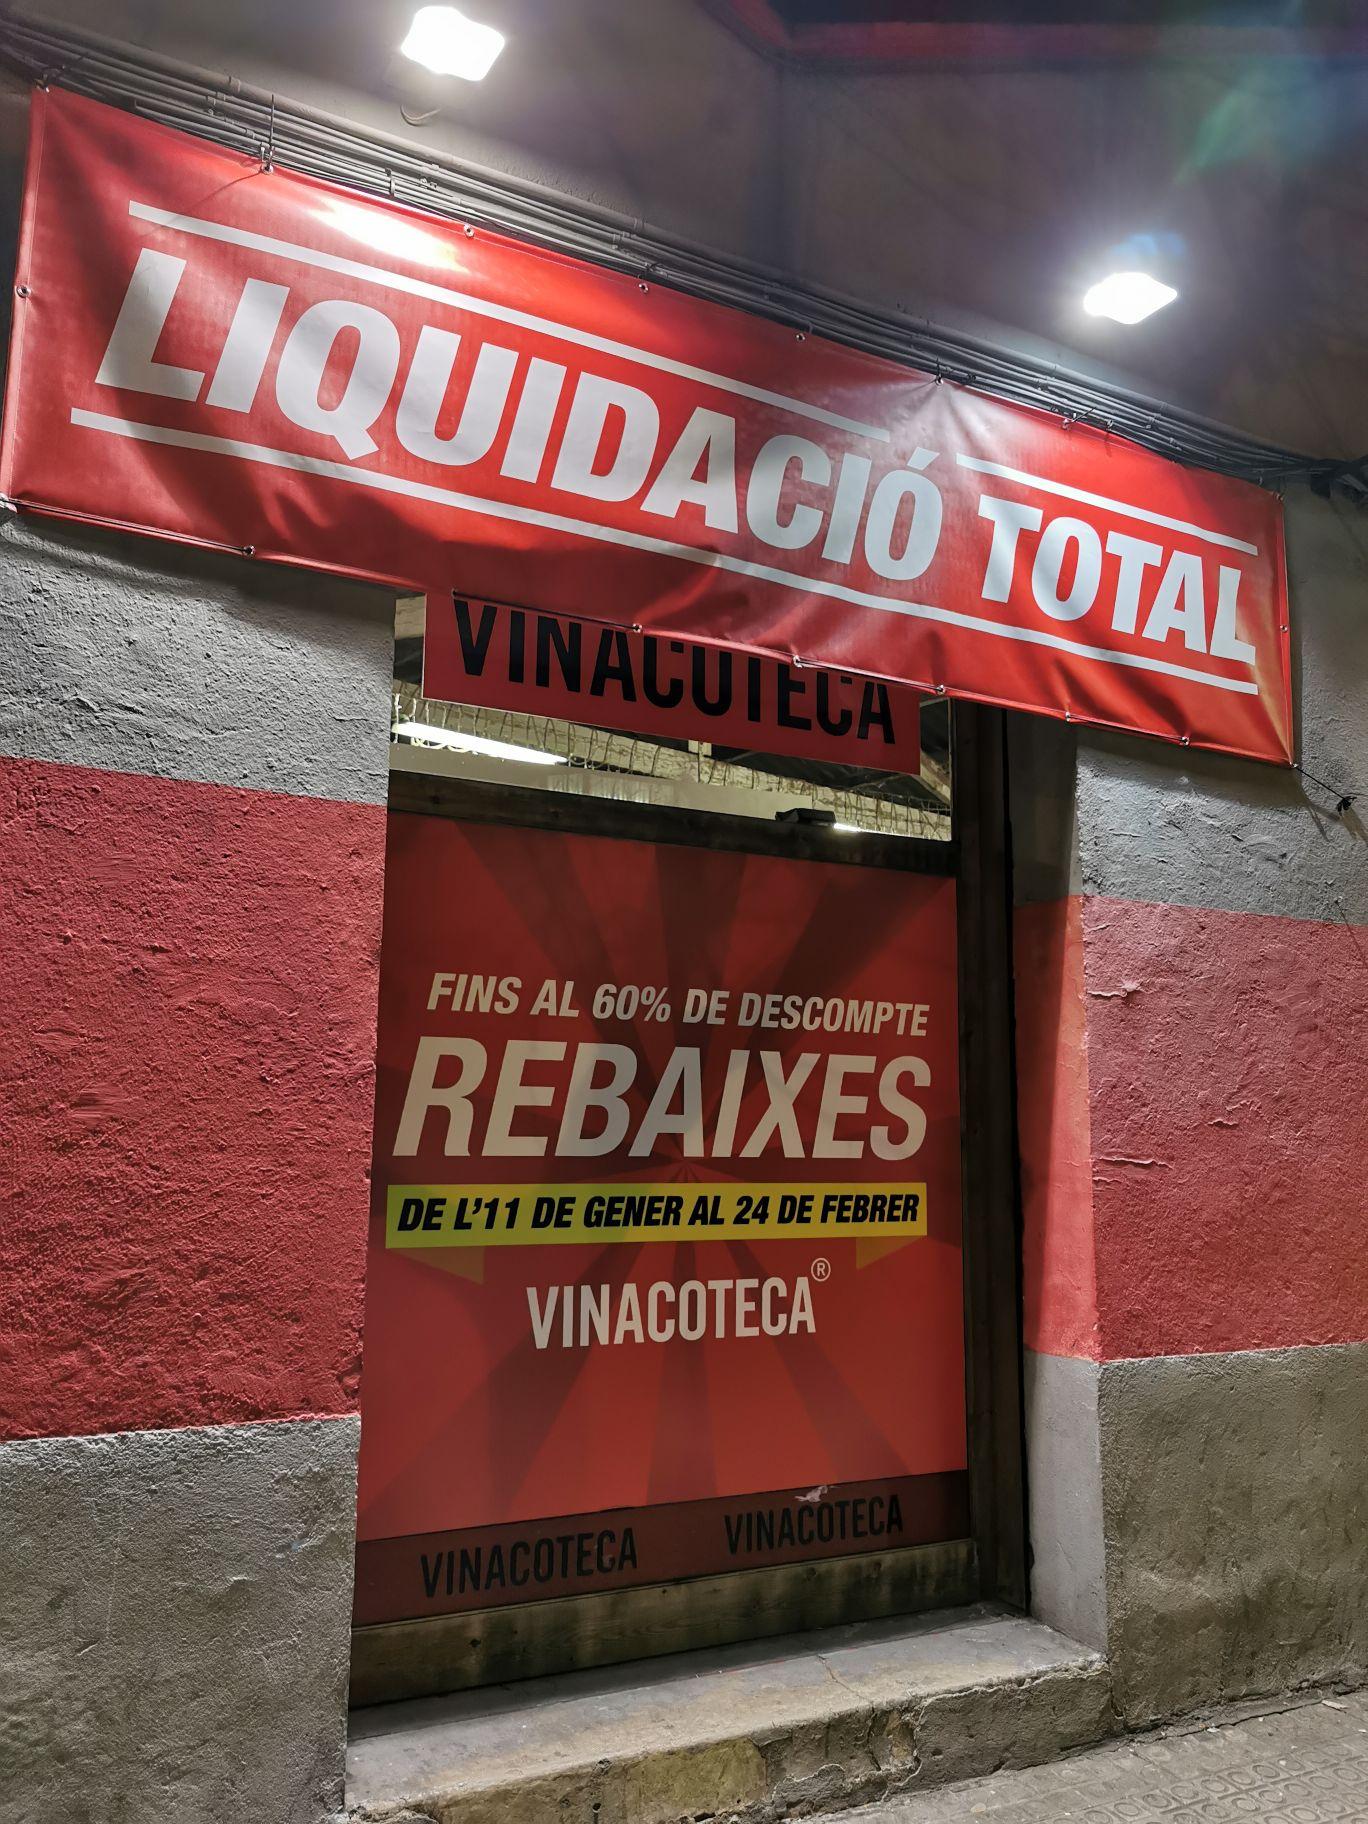 Liquidación en VINACOTECA CLOT (Barcelona)